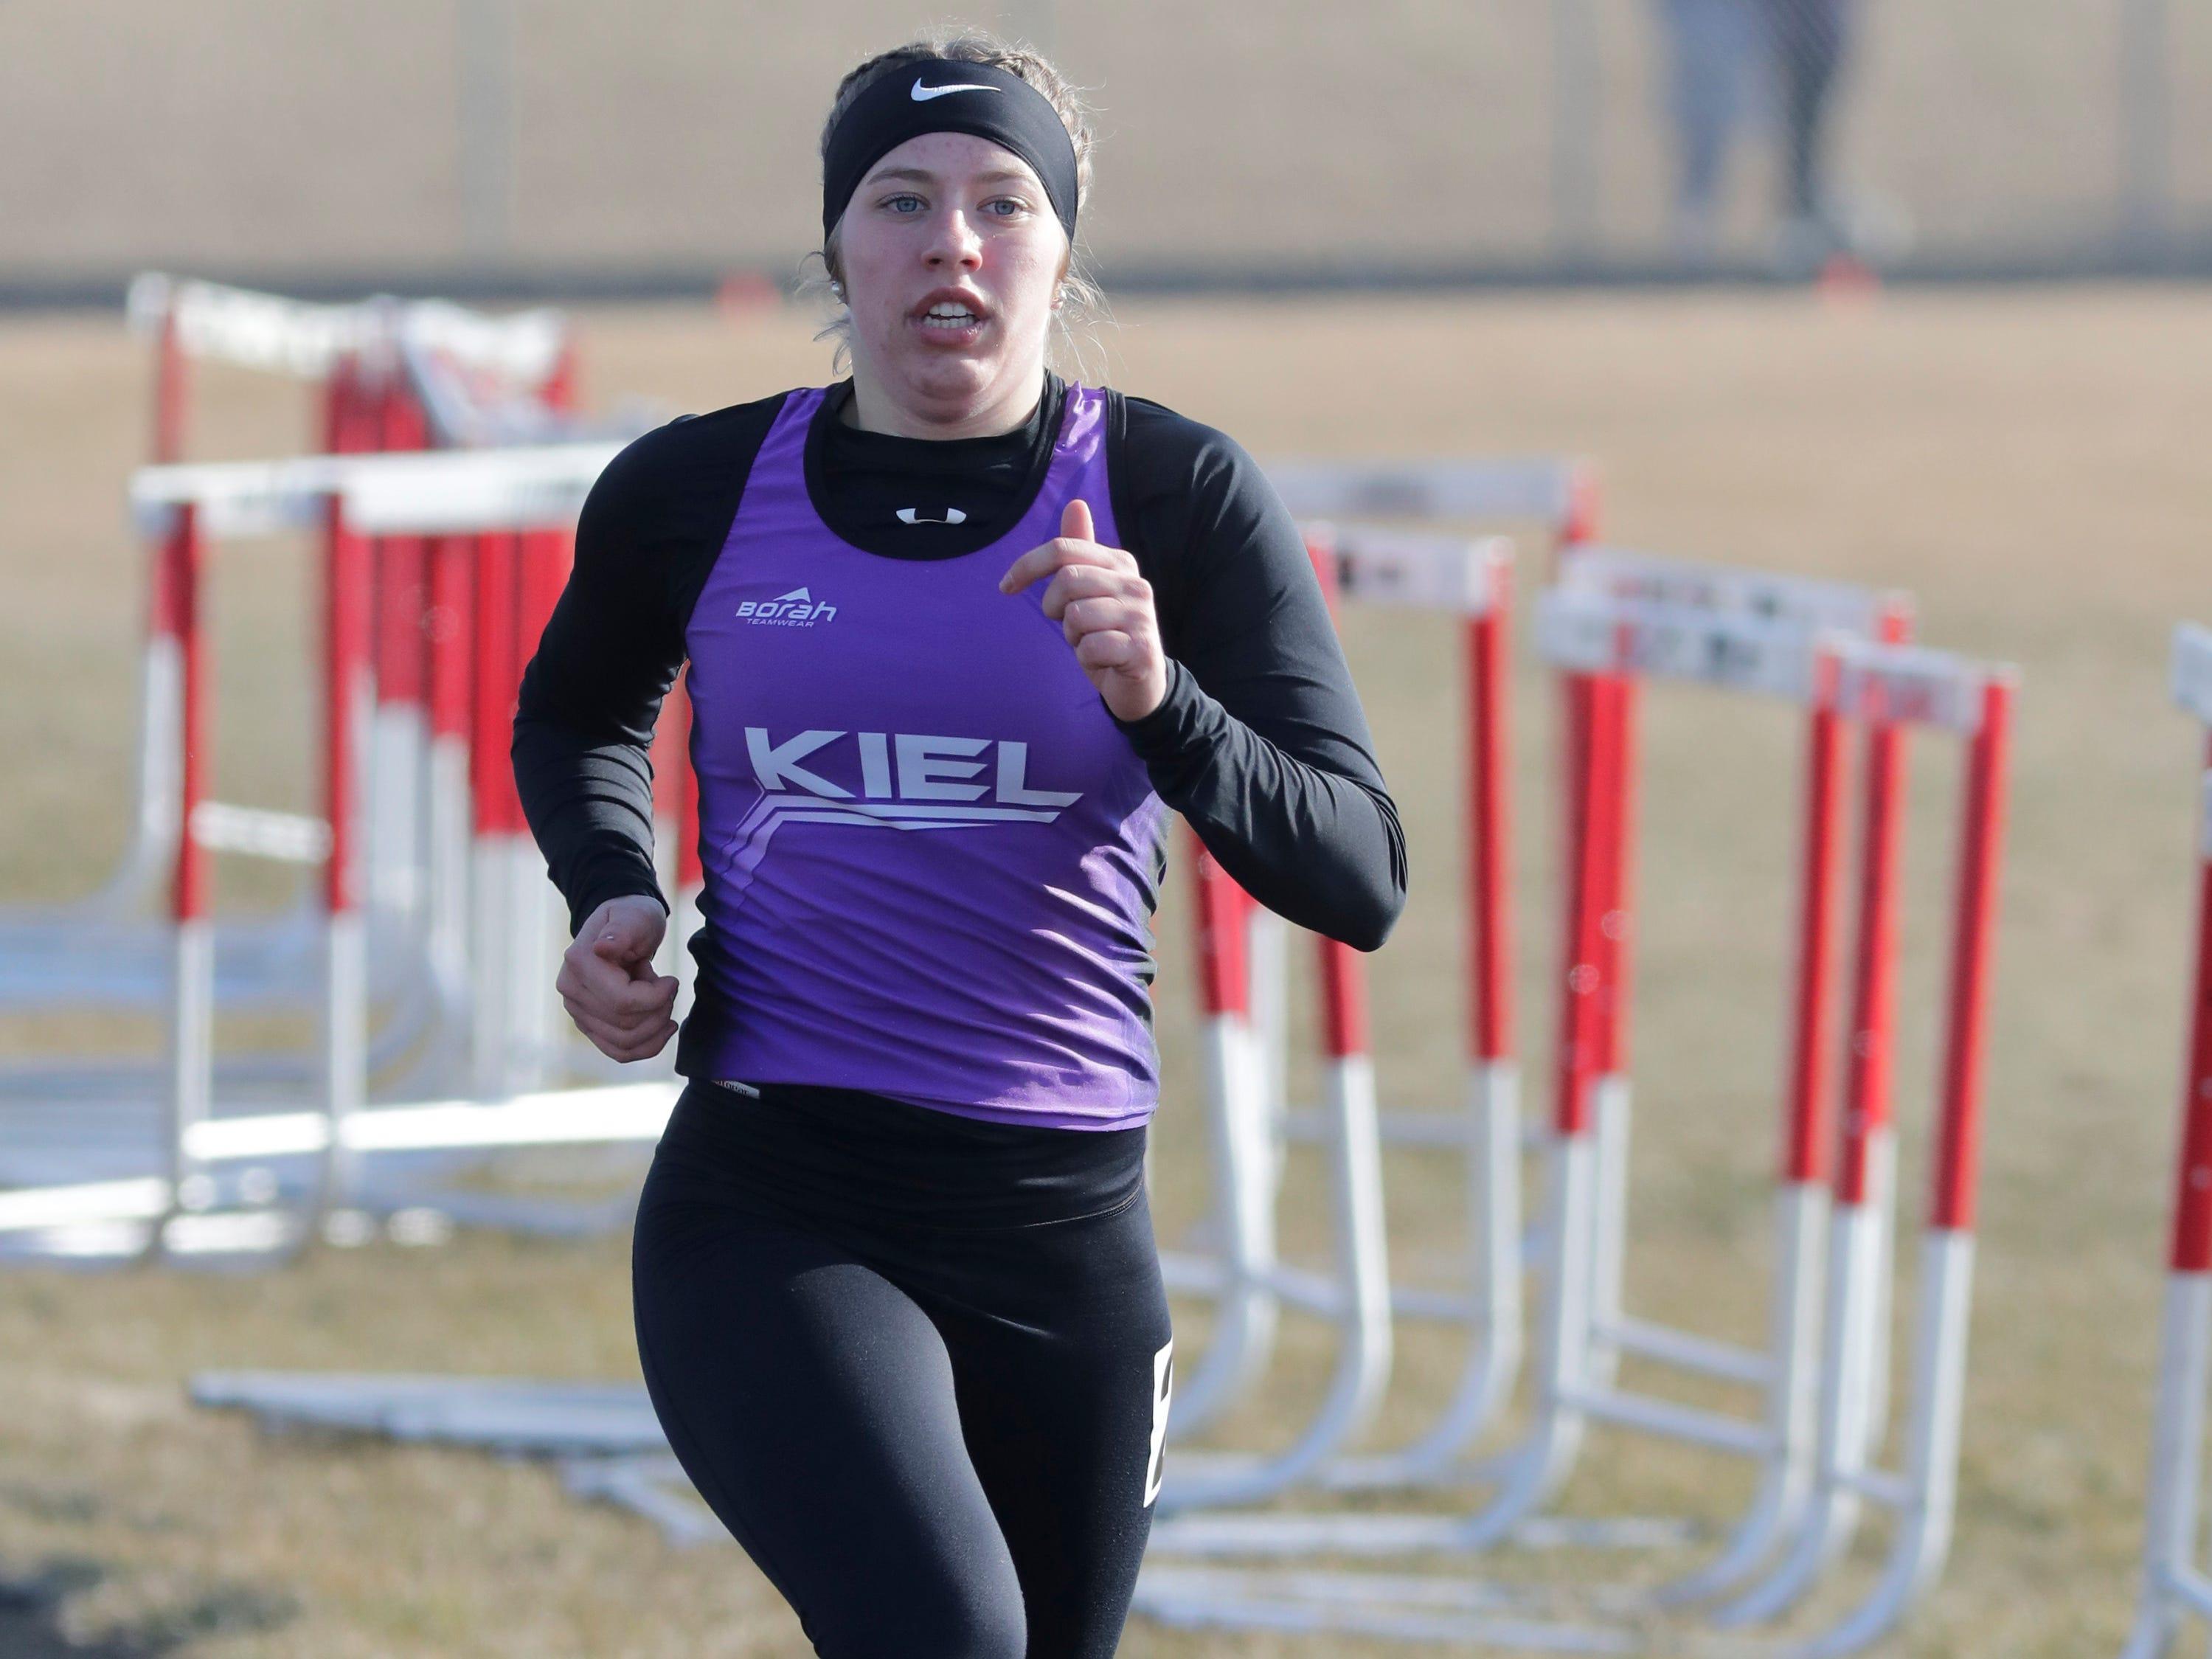 Kiel's Julia Koenig runs the 1600 meter run at the Flying Dutchmen Invite, Friday, April 5, 2019, in Oostburg, Wis.